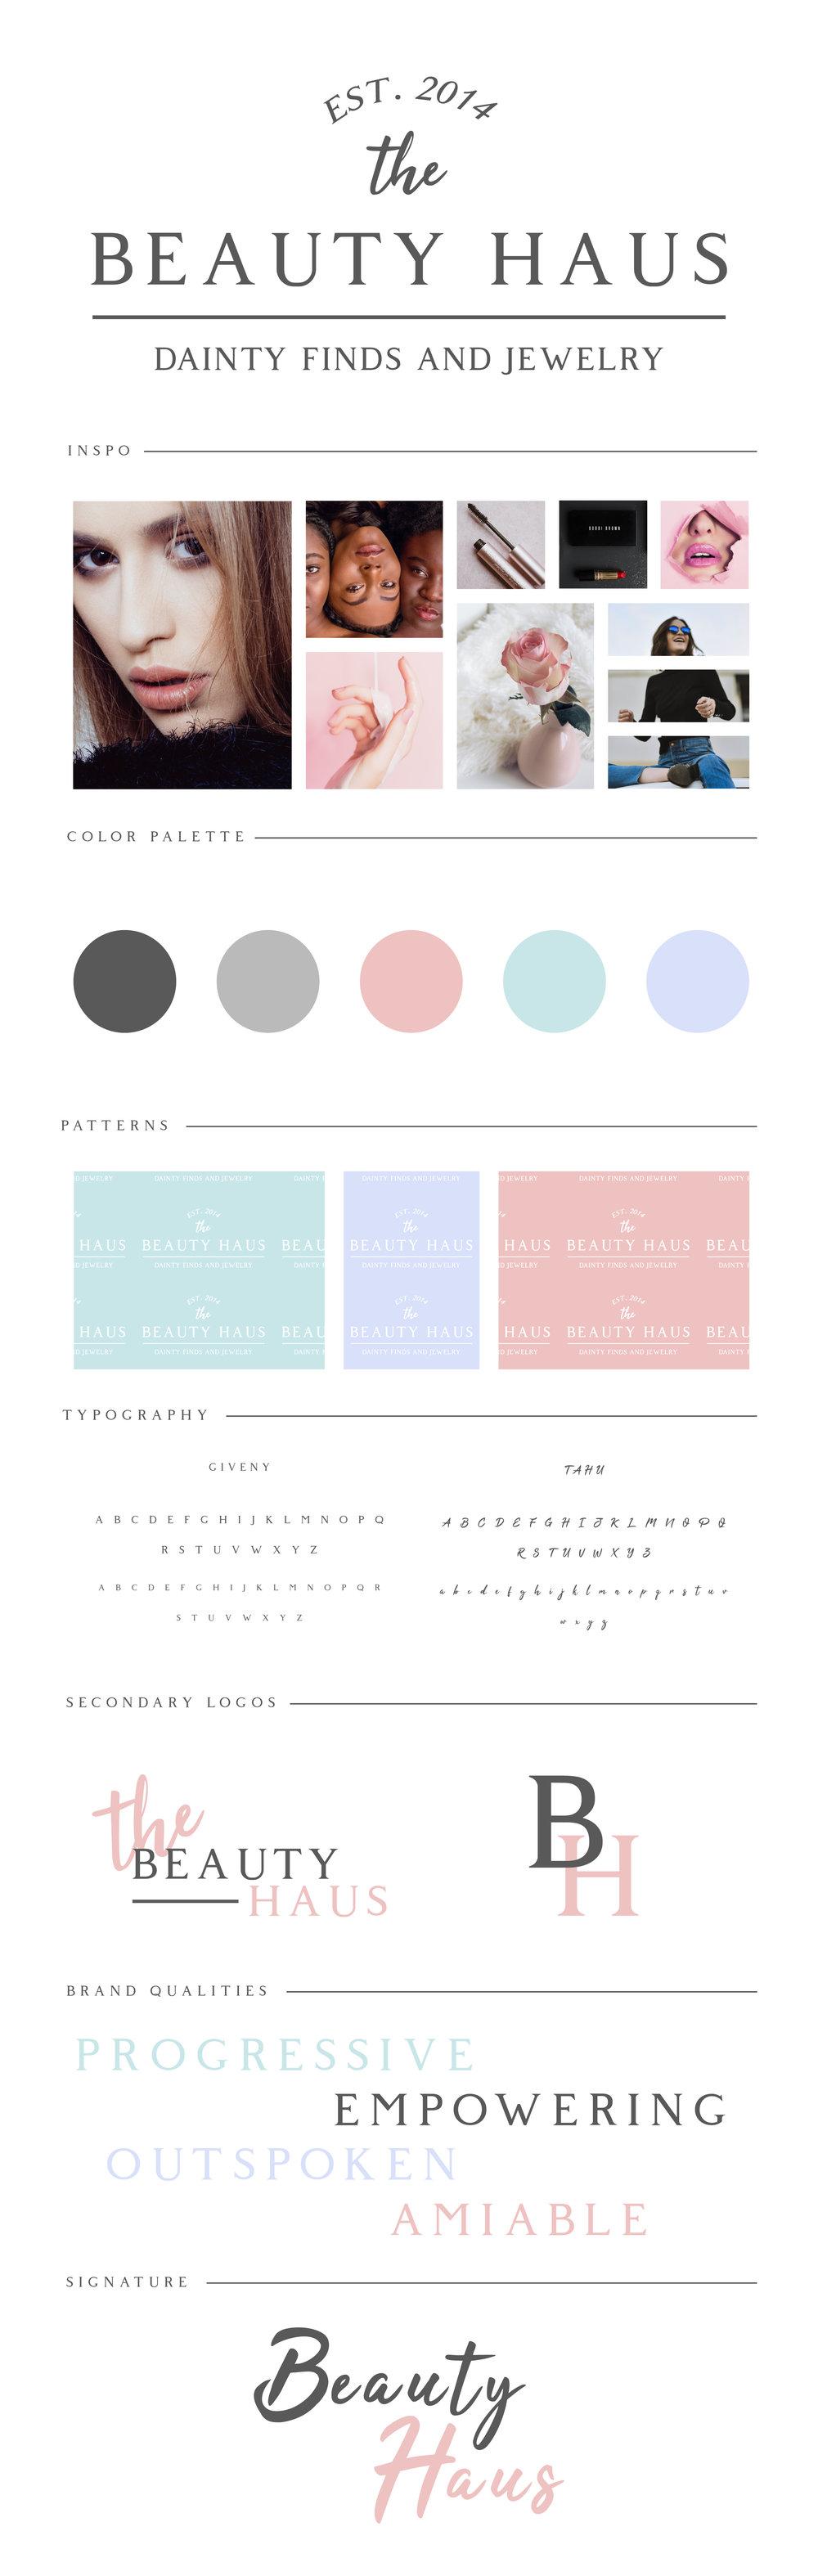 The BEAUTY HAUS Brand Strategy Guide by Kenzi Green Design #branding #logodesign #beautybrand #brandidentity